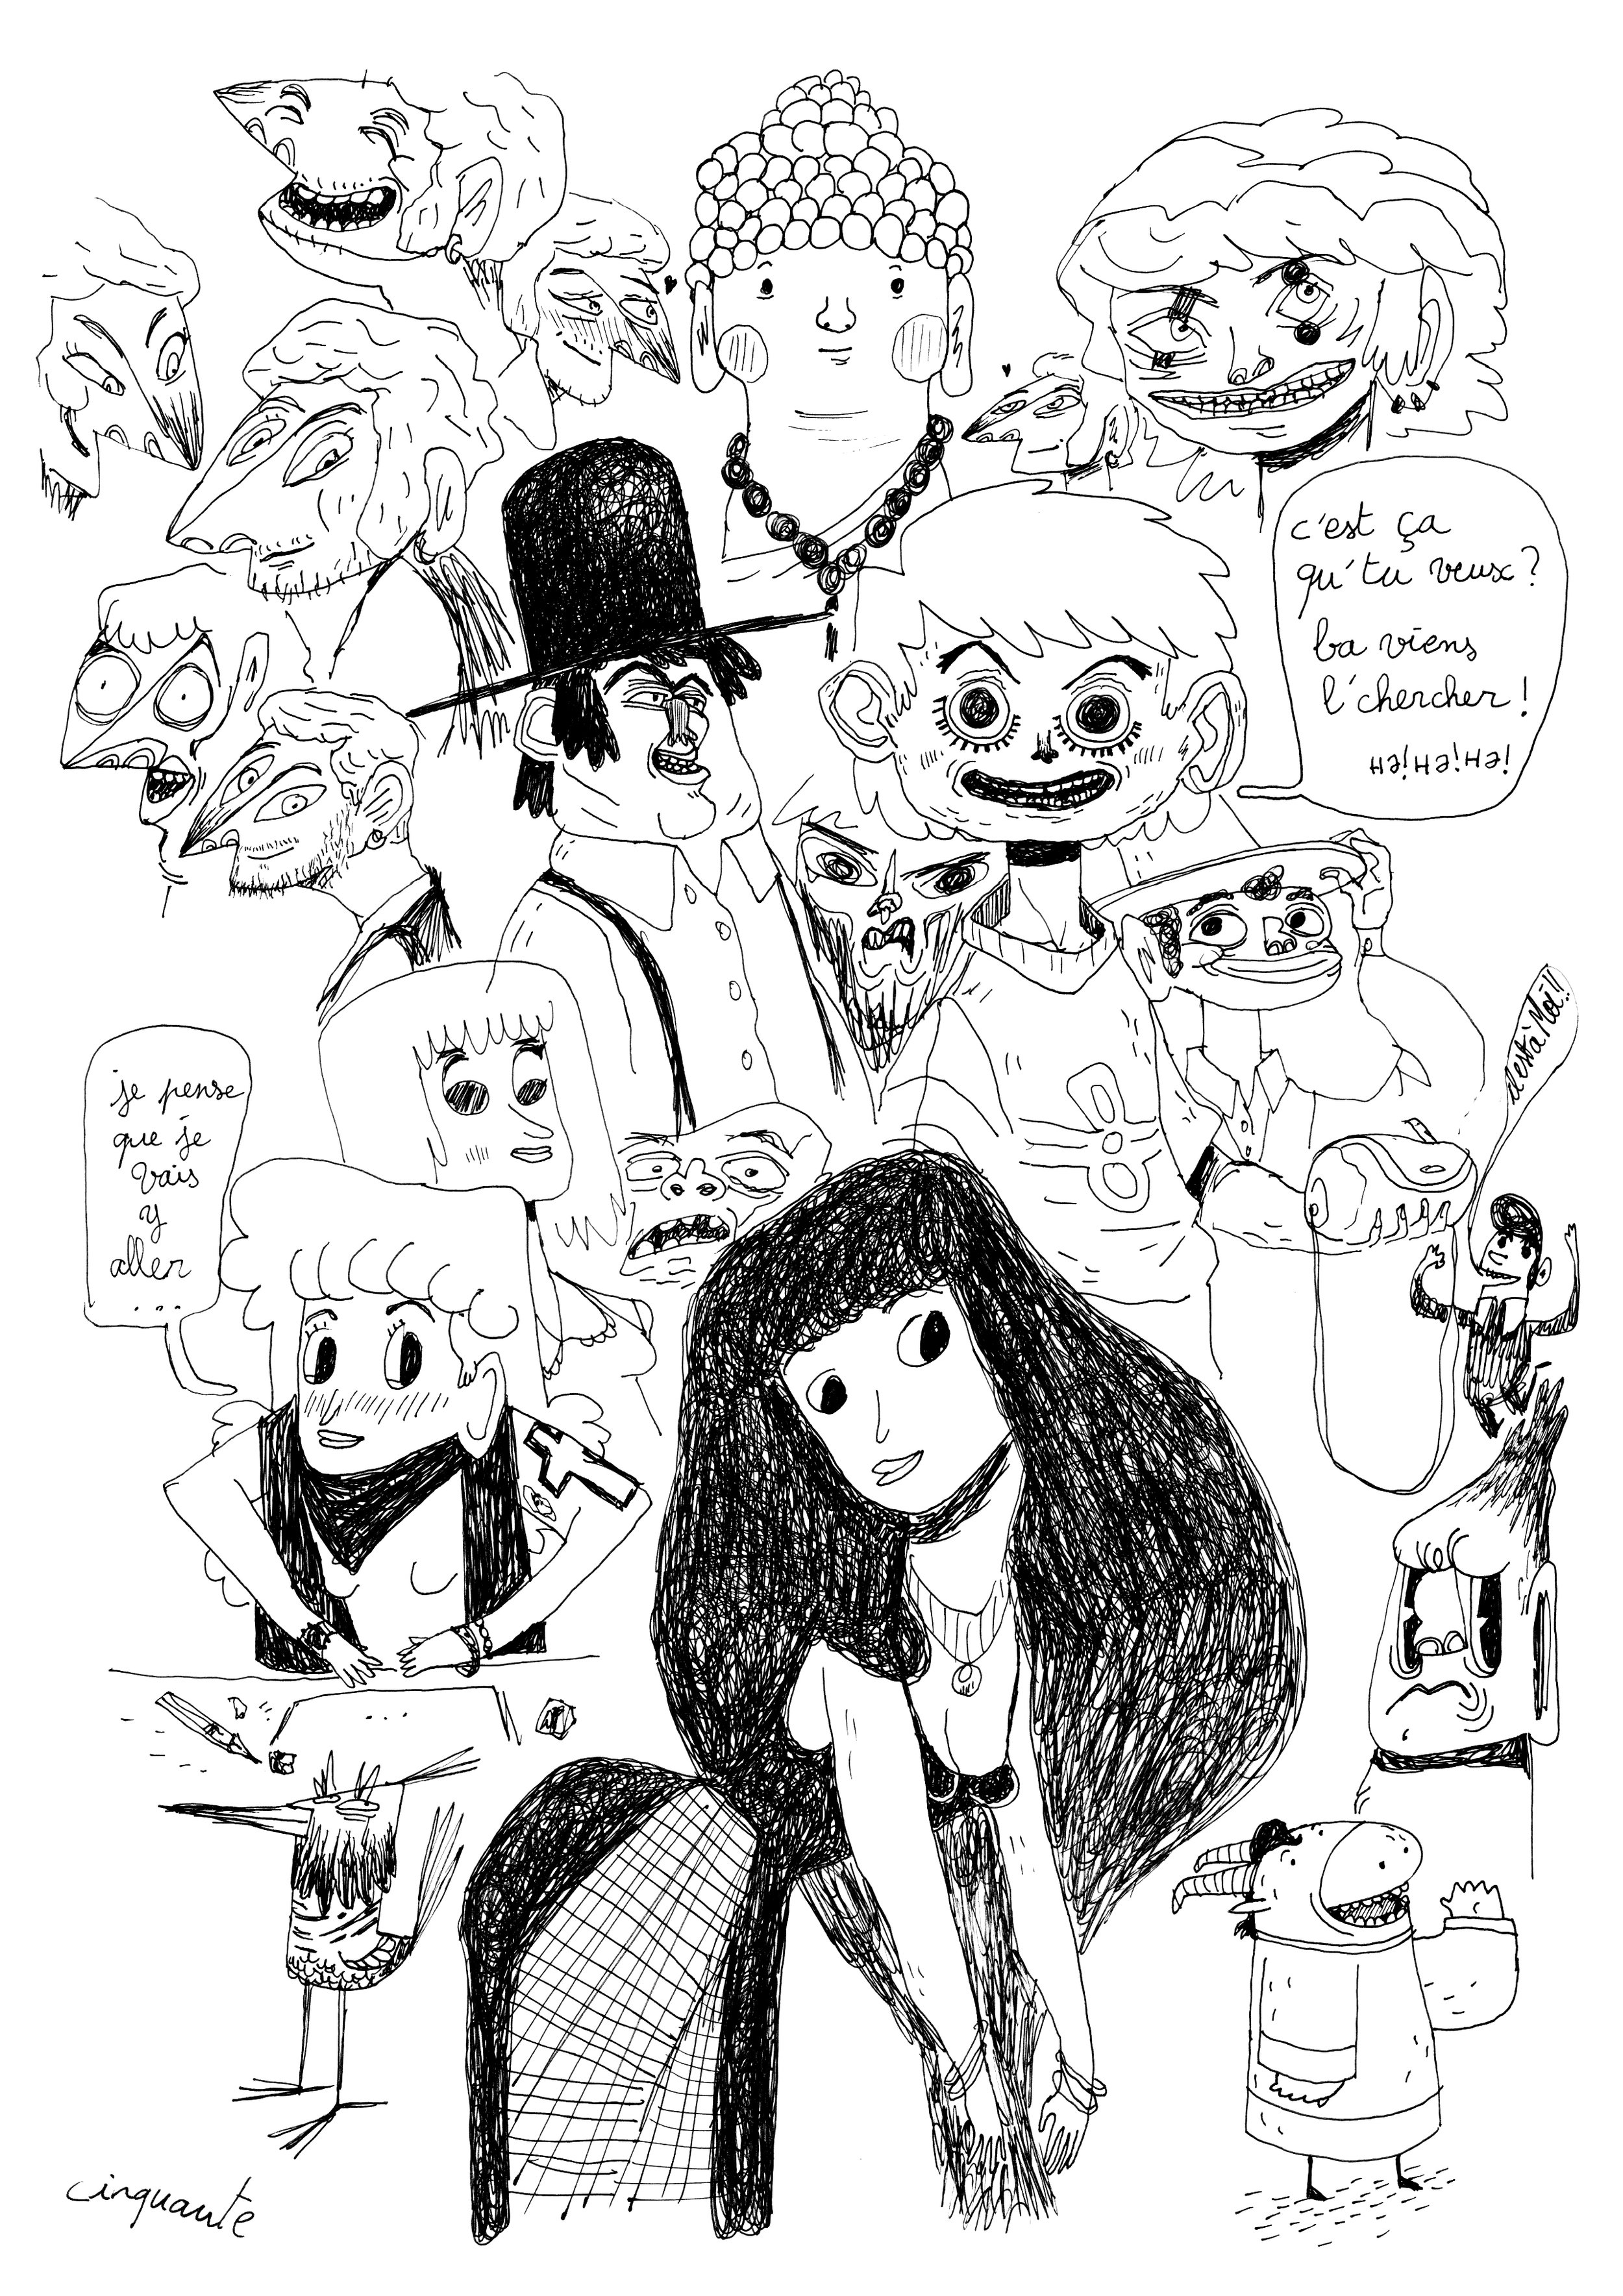 Pascal_Zaffiro_Doodle_12.jpg